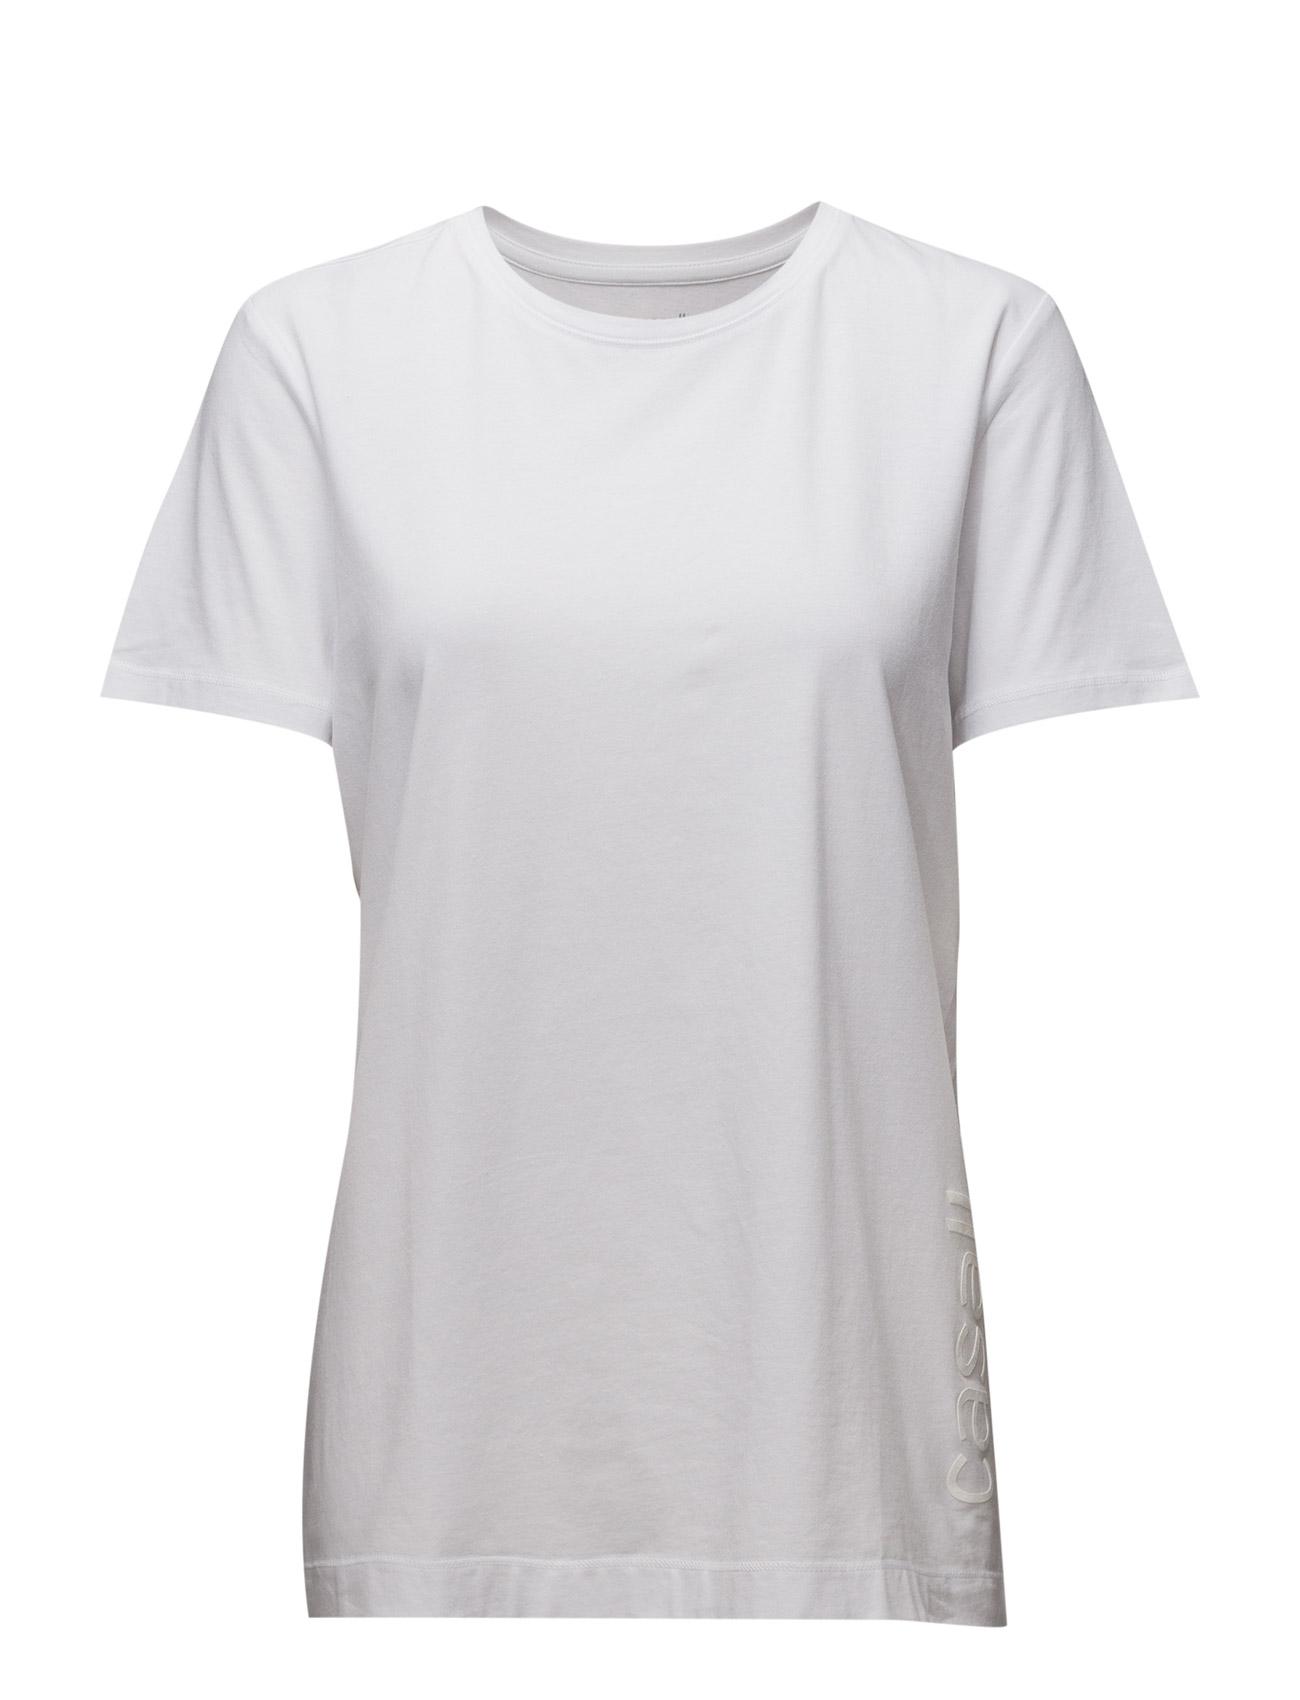 Oversized Tee Casall Løbe t-shirts til Damer i hvid